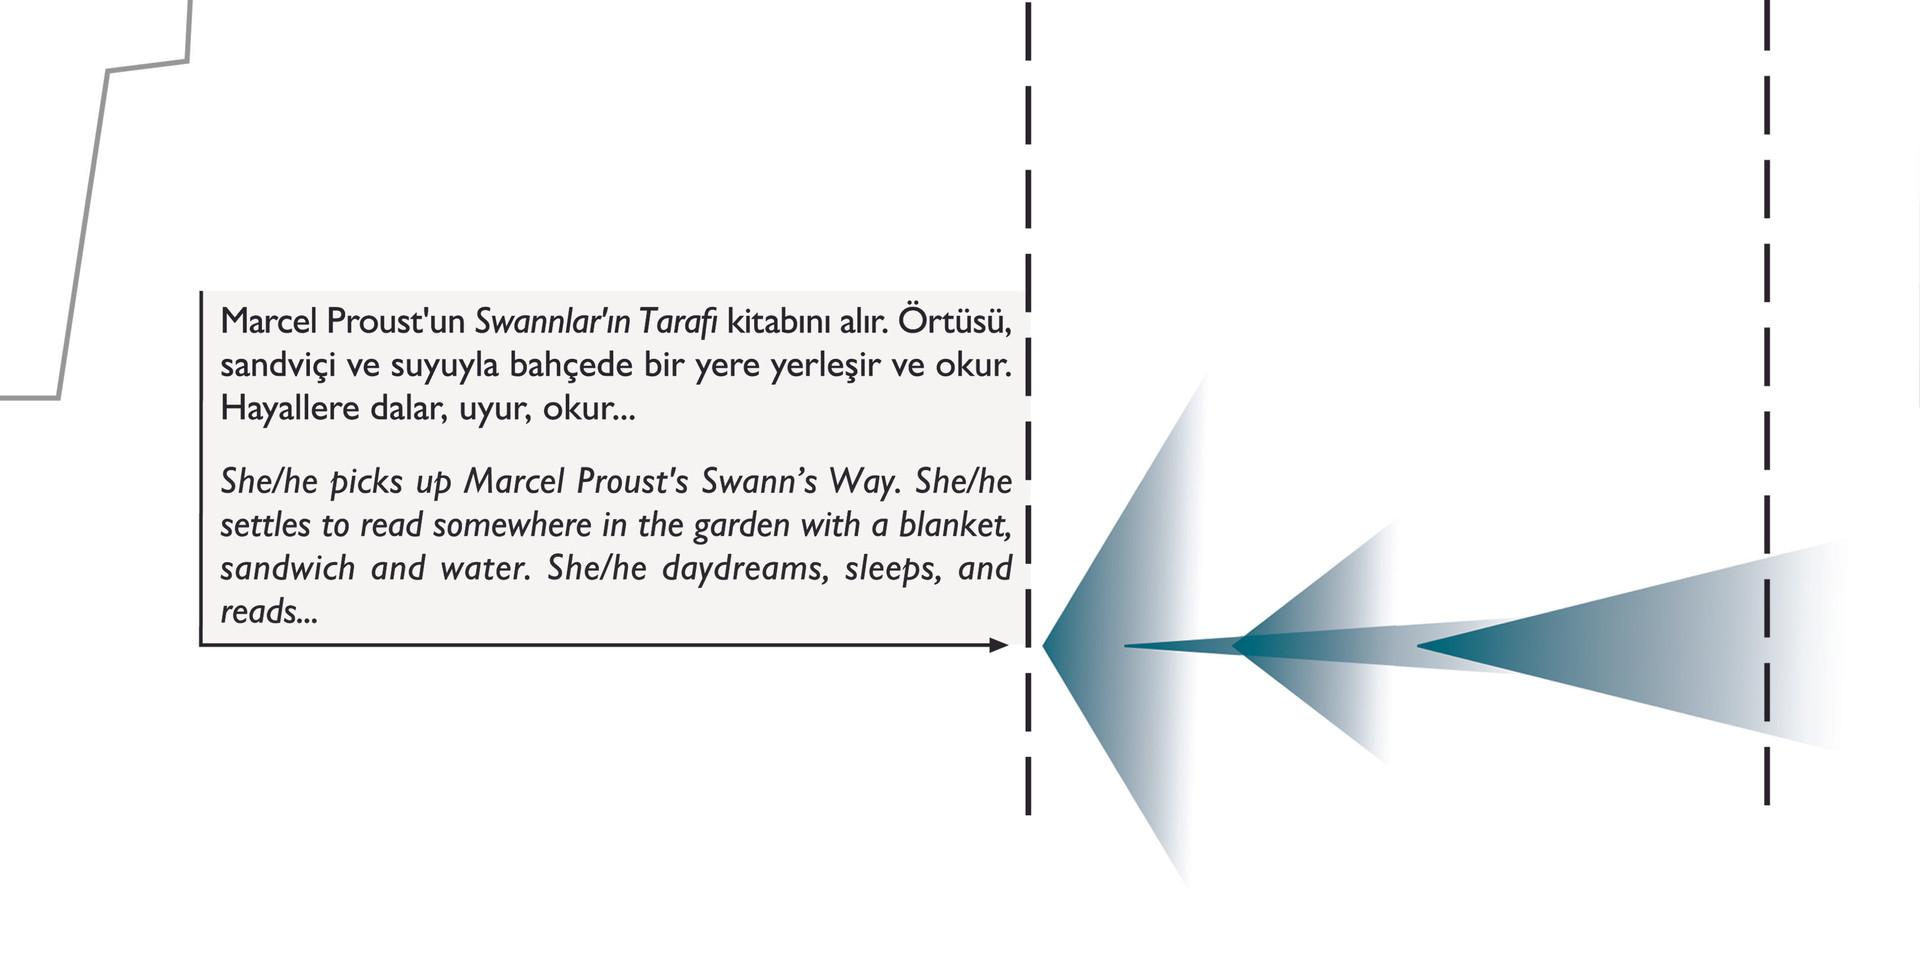 timetable_detail_11.jpg